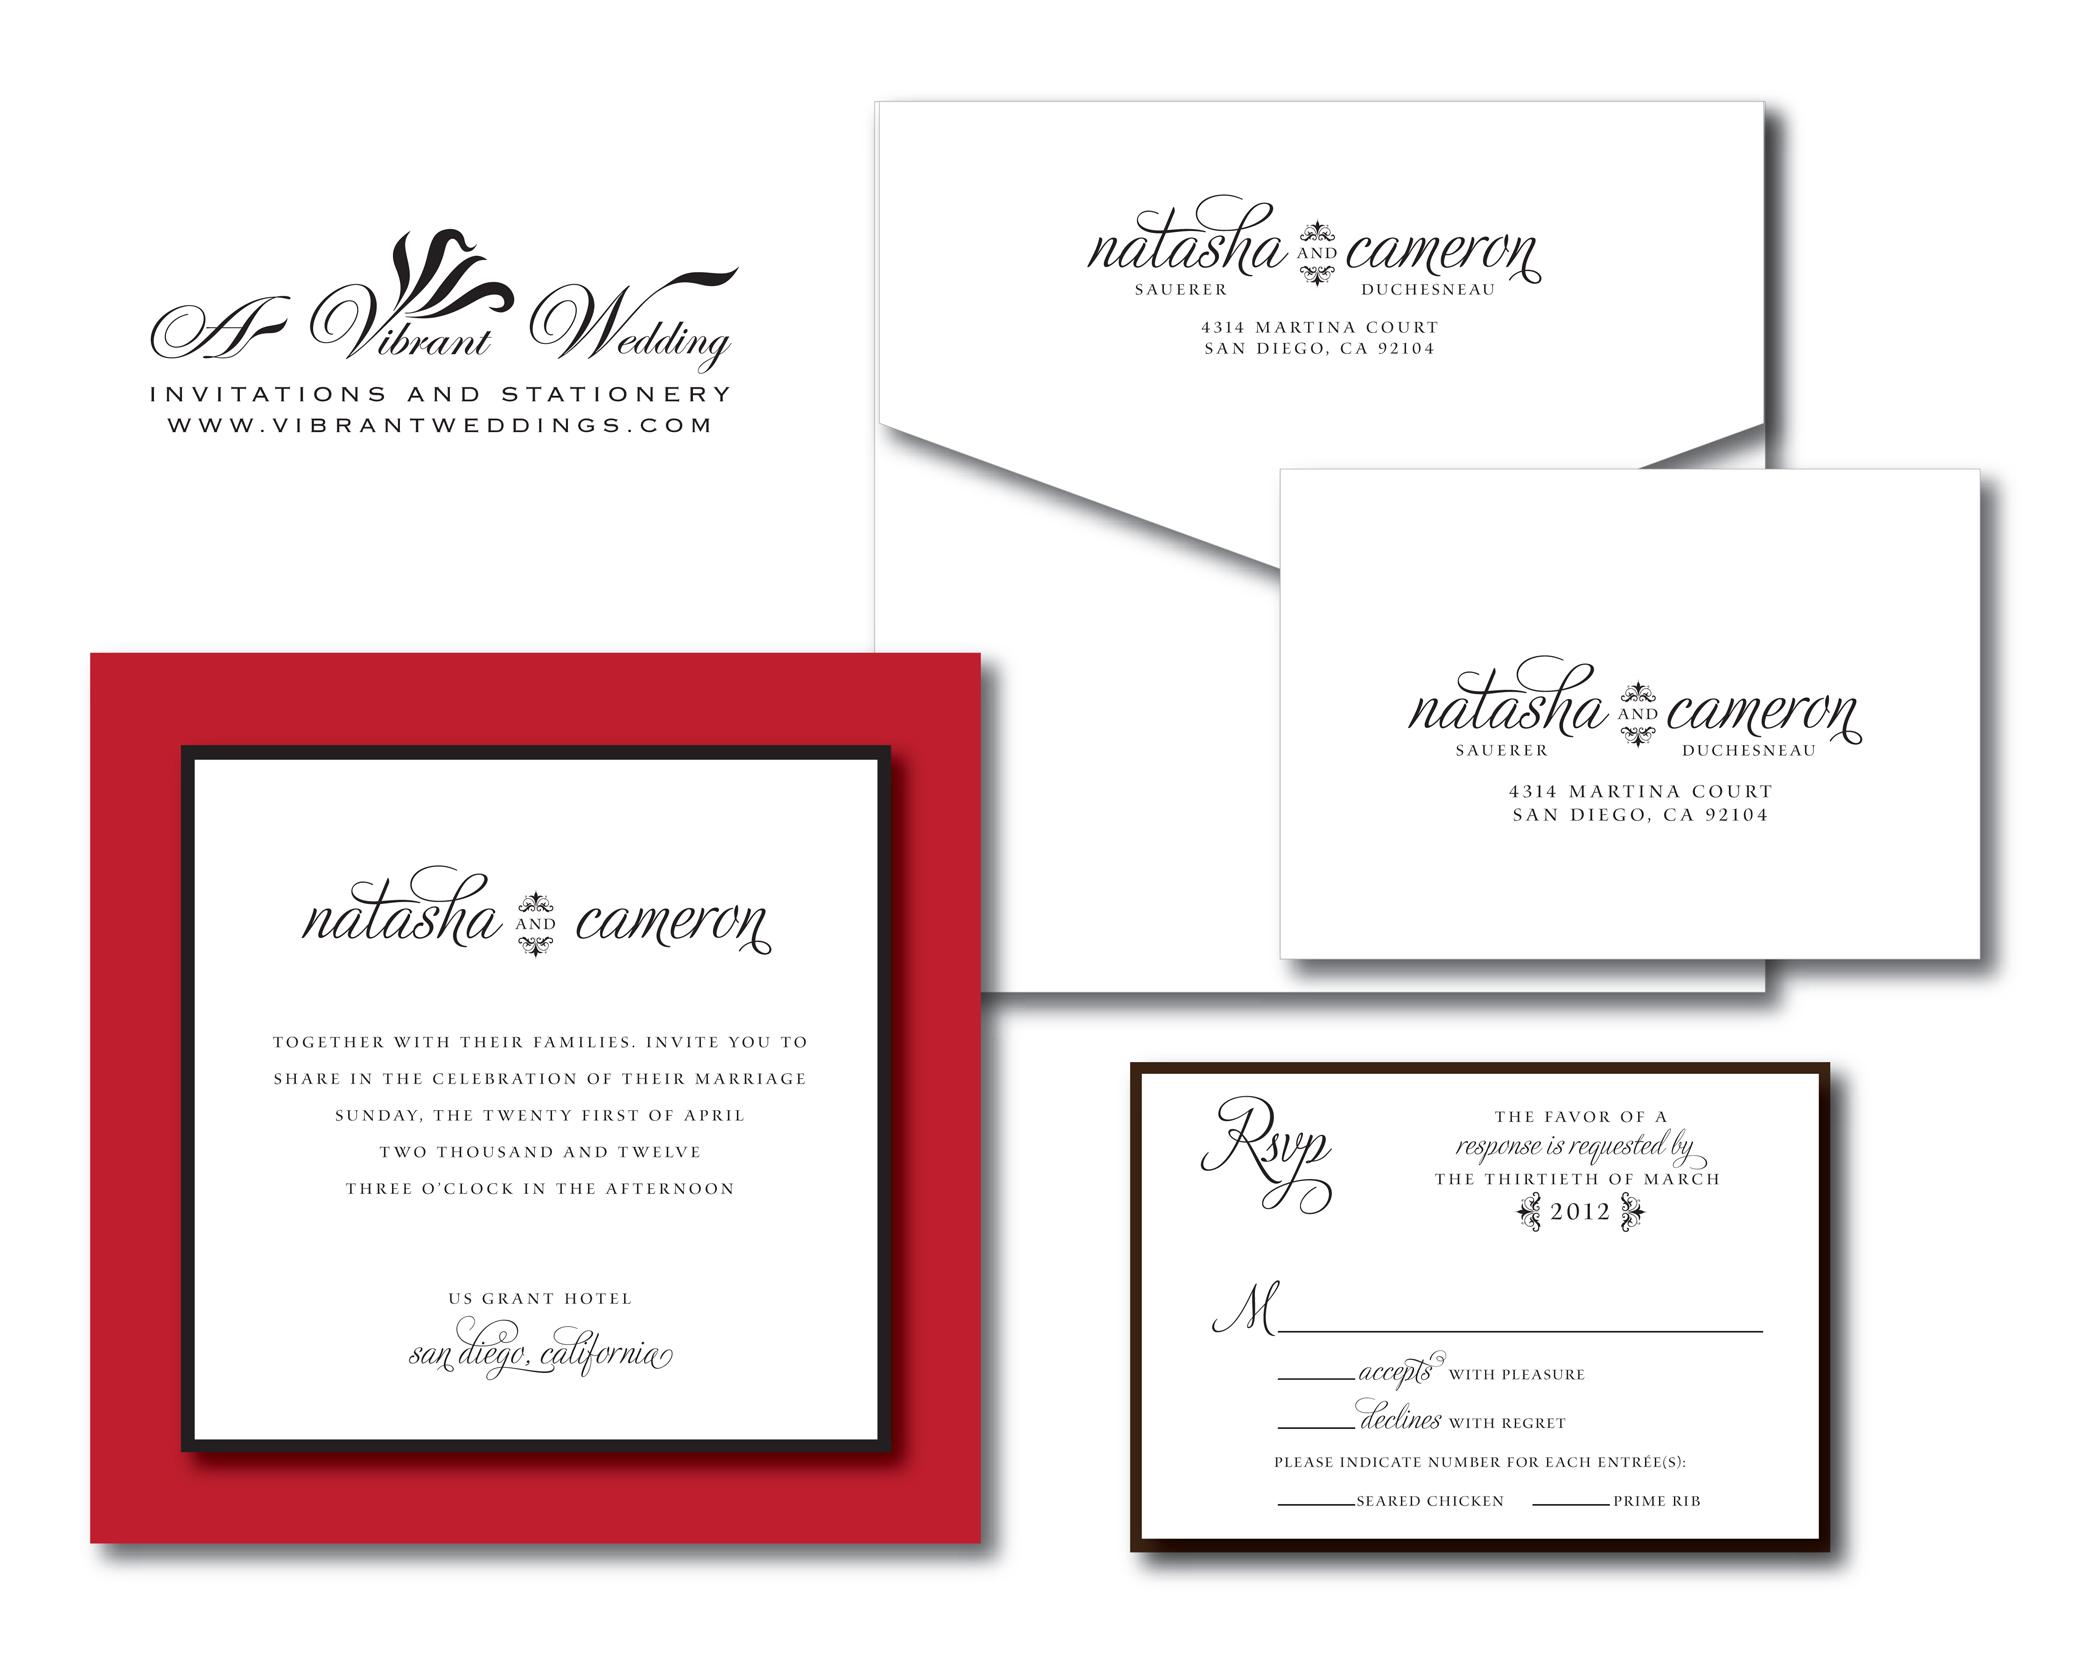 Red Wedding invitation – A Vibrant Wedding